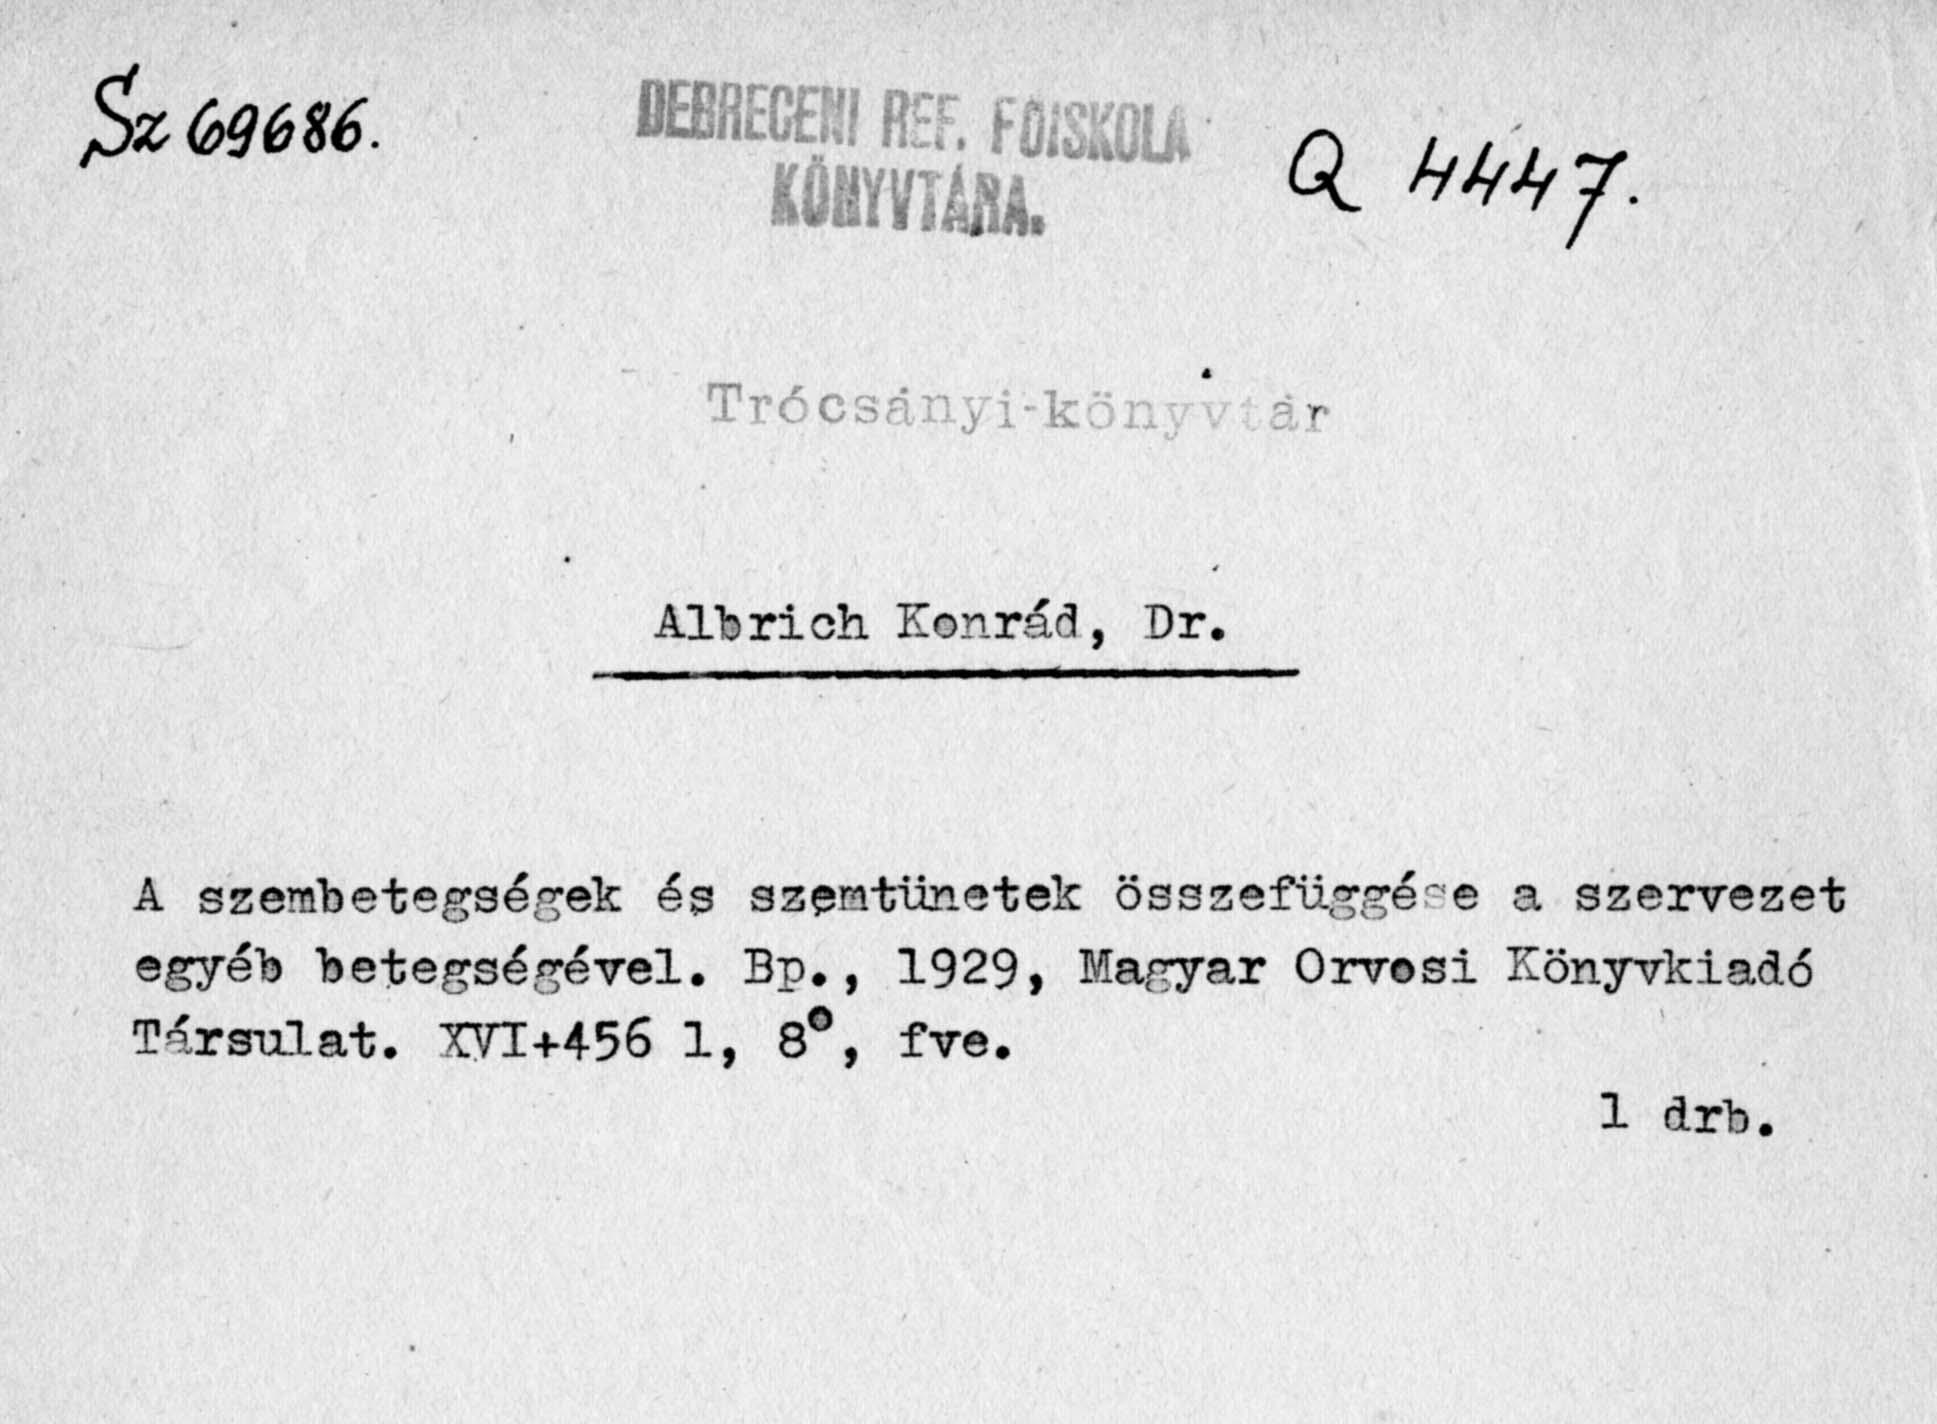 Magyar Nemzeti Digitális Archívum • Dr. Albrich Konrád 7bf187d419